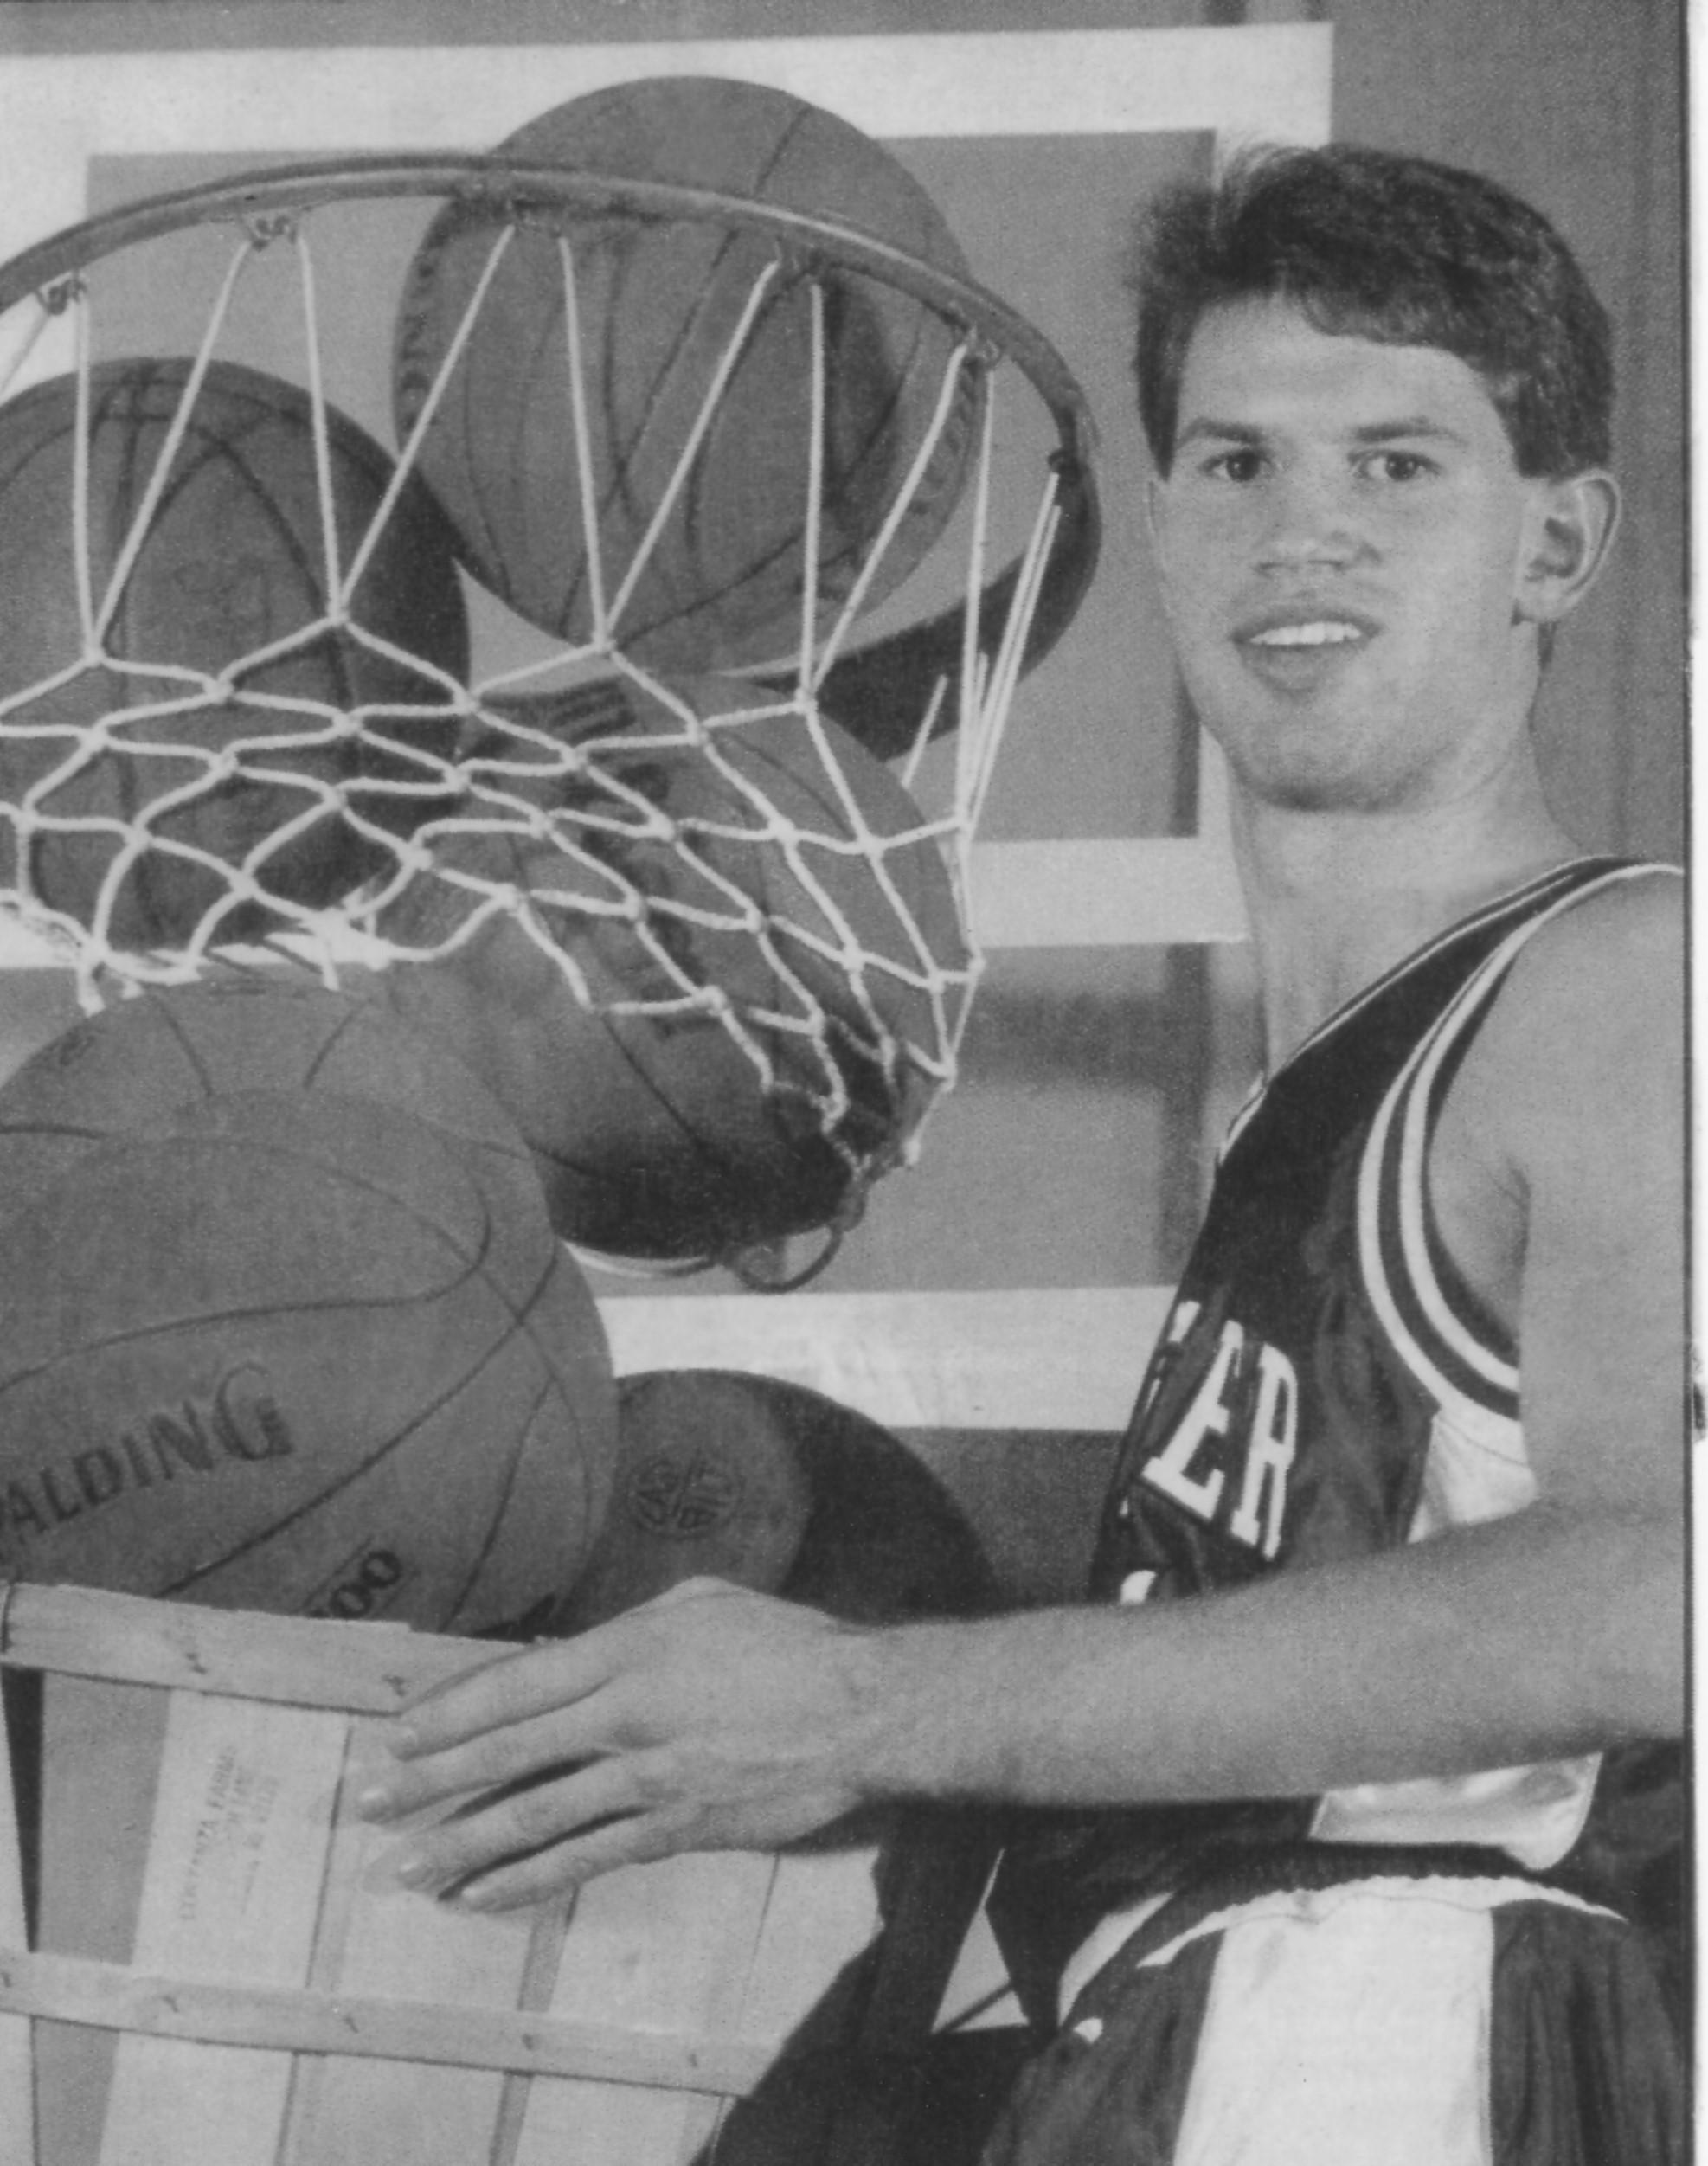 Aaron Dobberstein '93